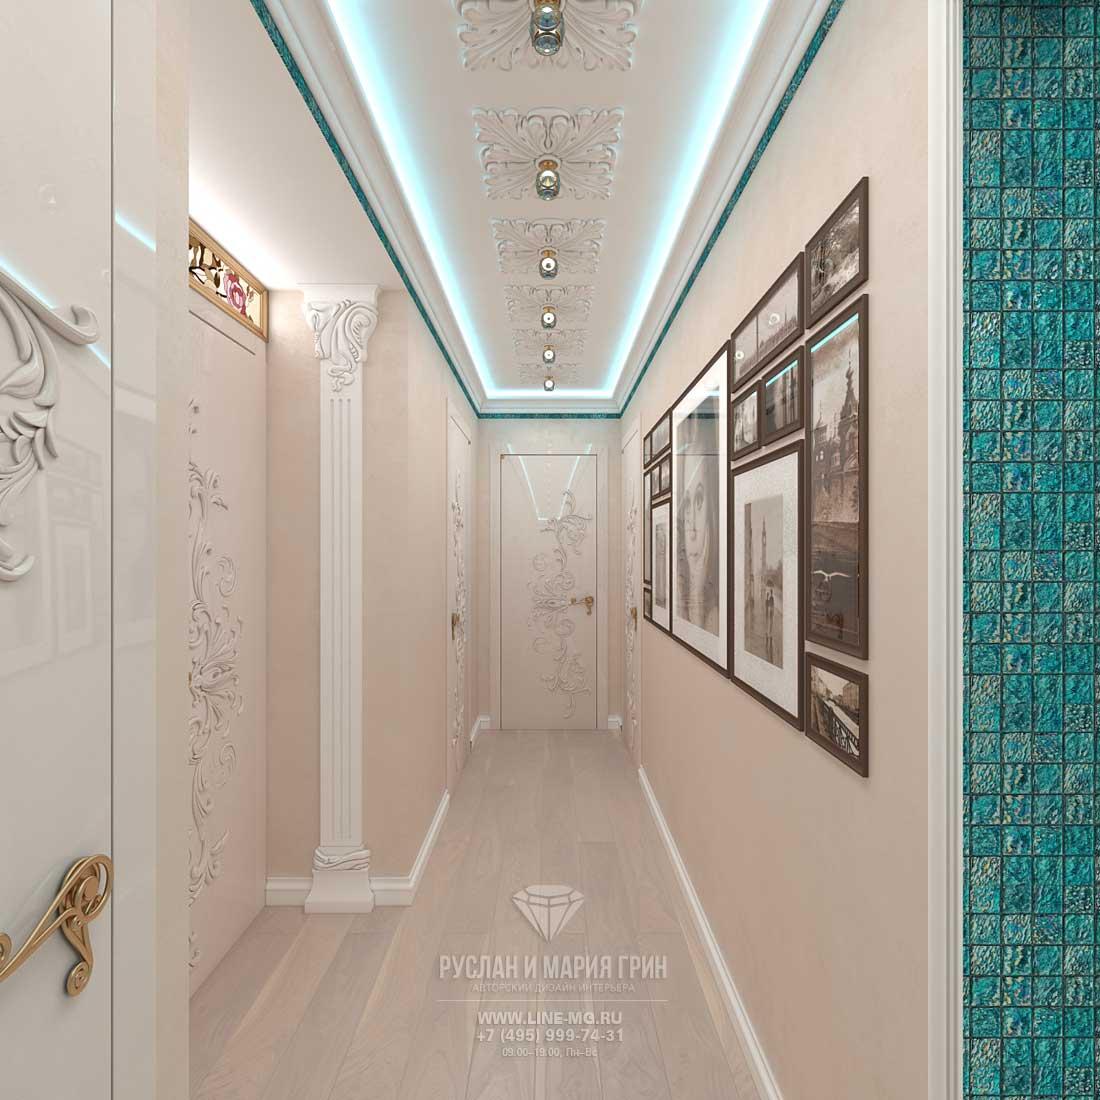 Дизайн интерьера коридора: фото